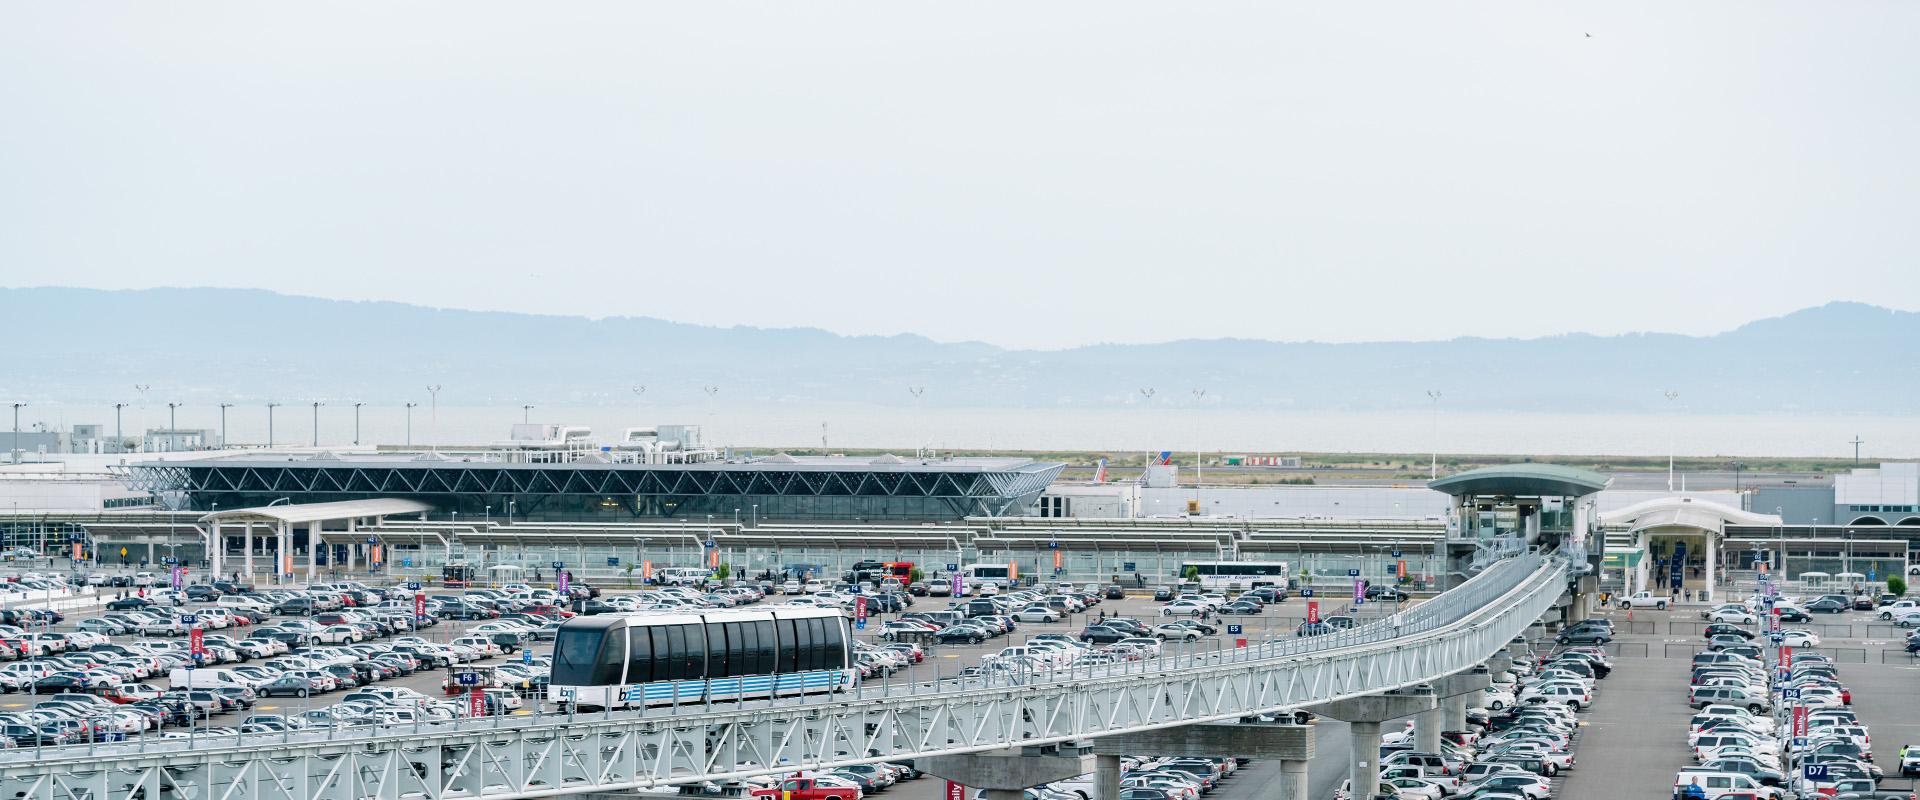 Image of Terminal Modernization & Development